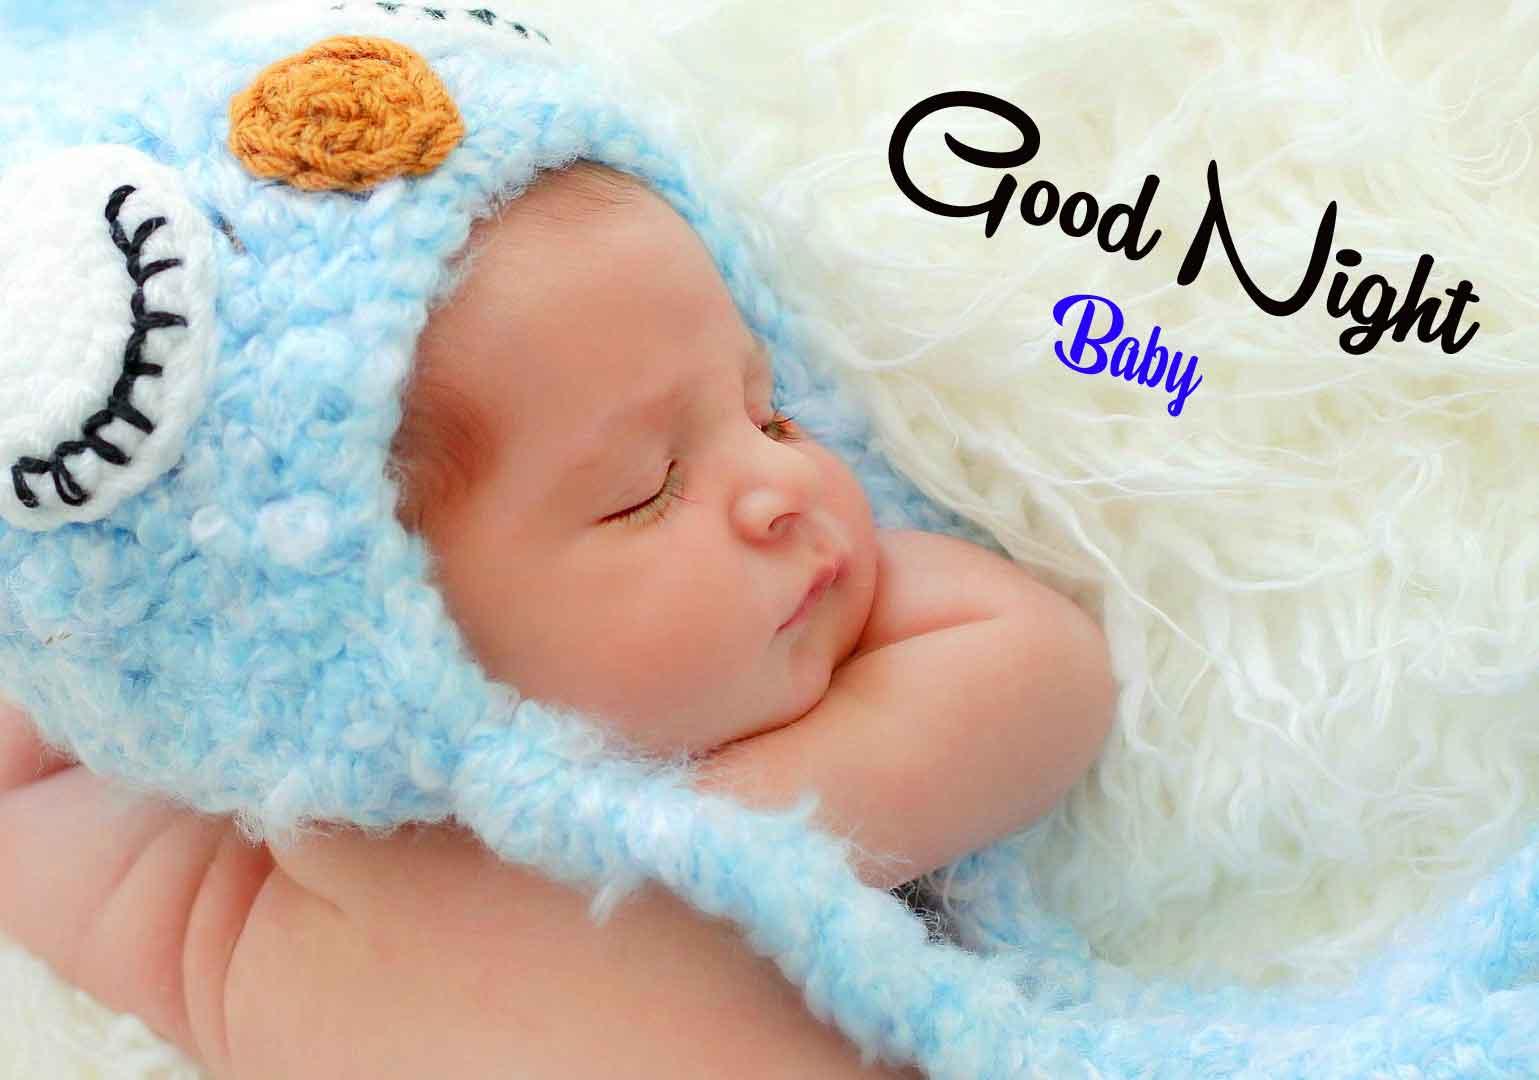 Fresh good night cute baby Images